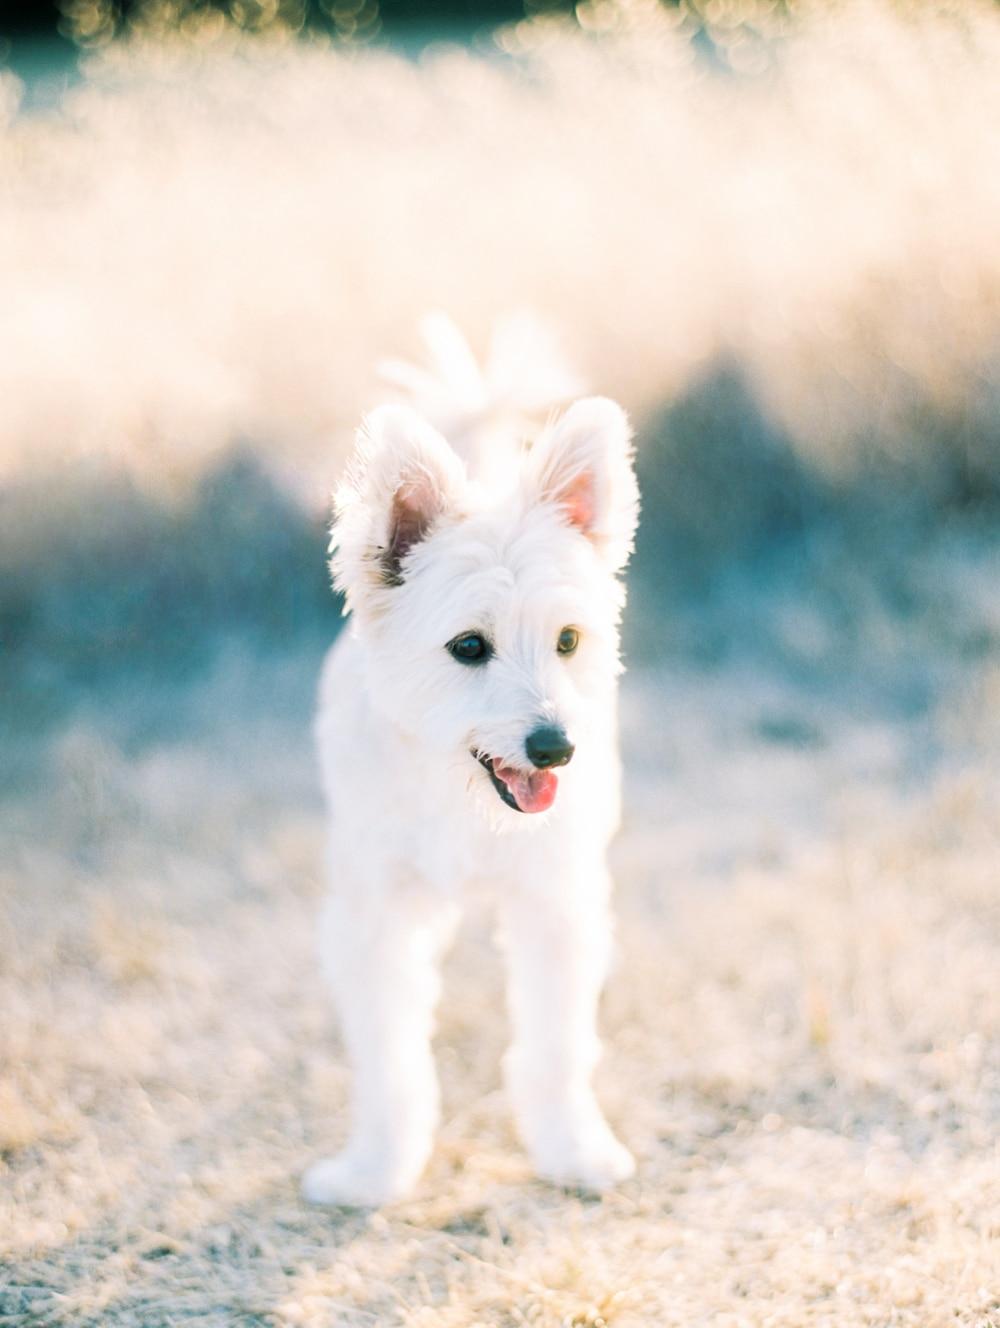 Kristin-La-Voie-Photography-california-wedding-photographer-dog-session-rancho-san-antonio-los-altos-49